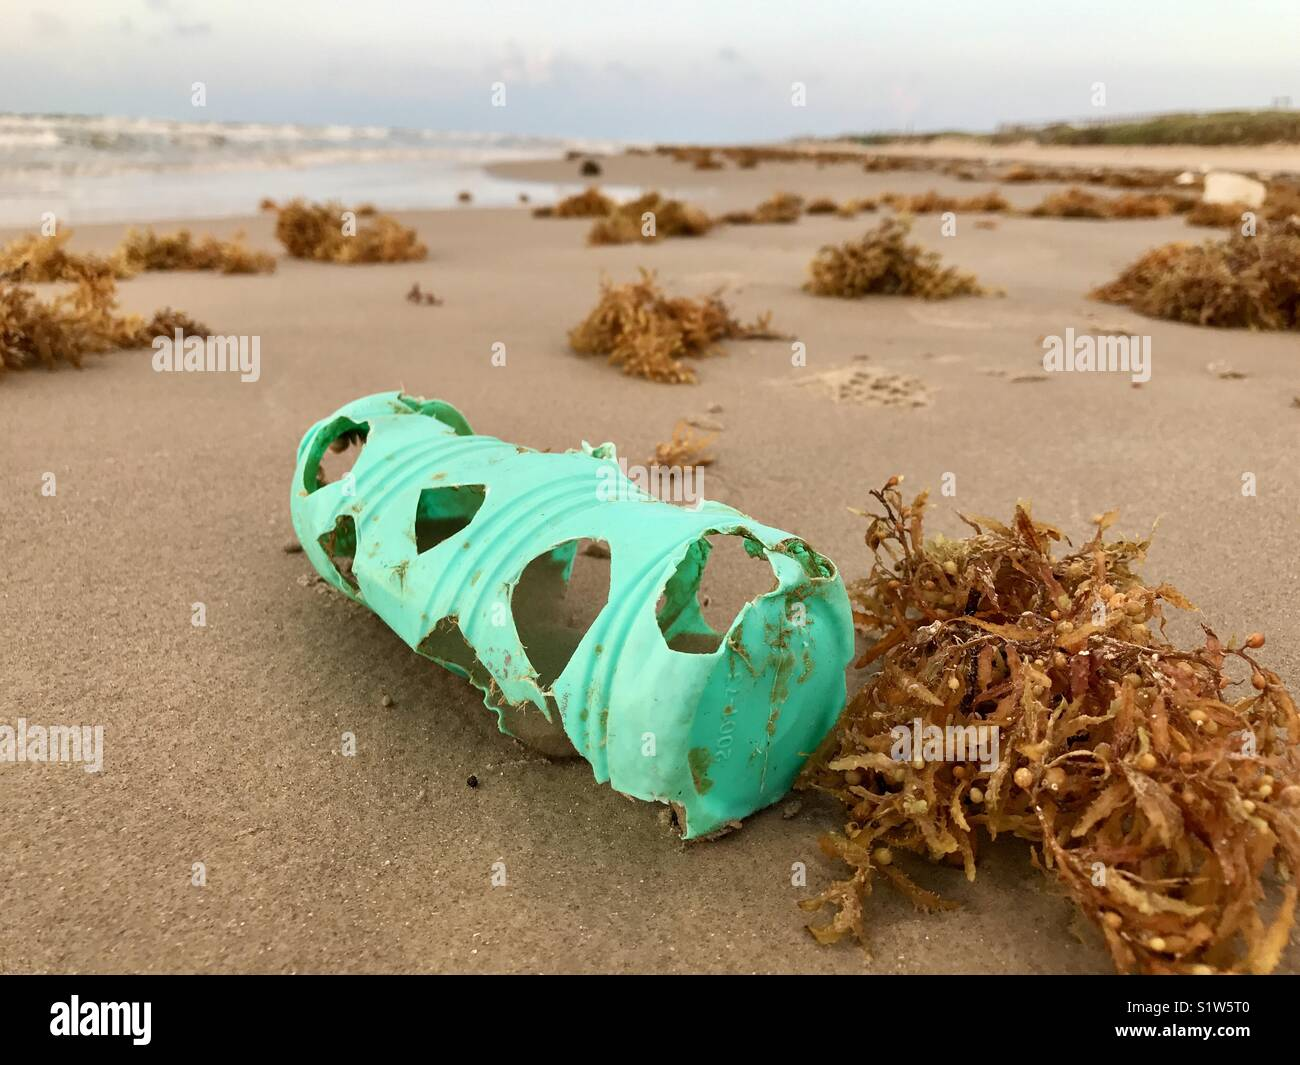 Turtle bites in plastic bottle on beach - Stock Image